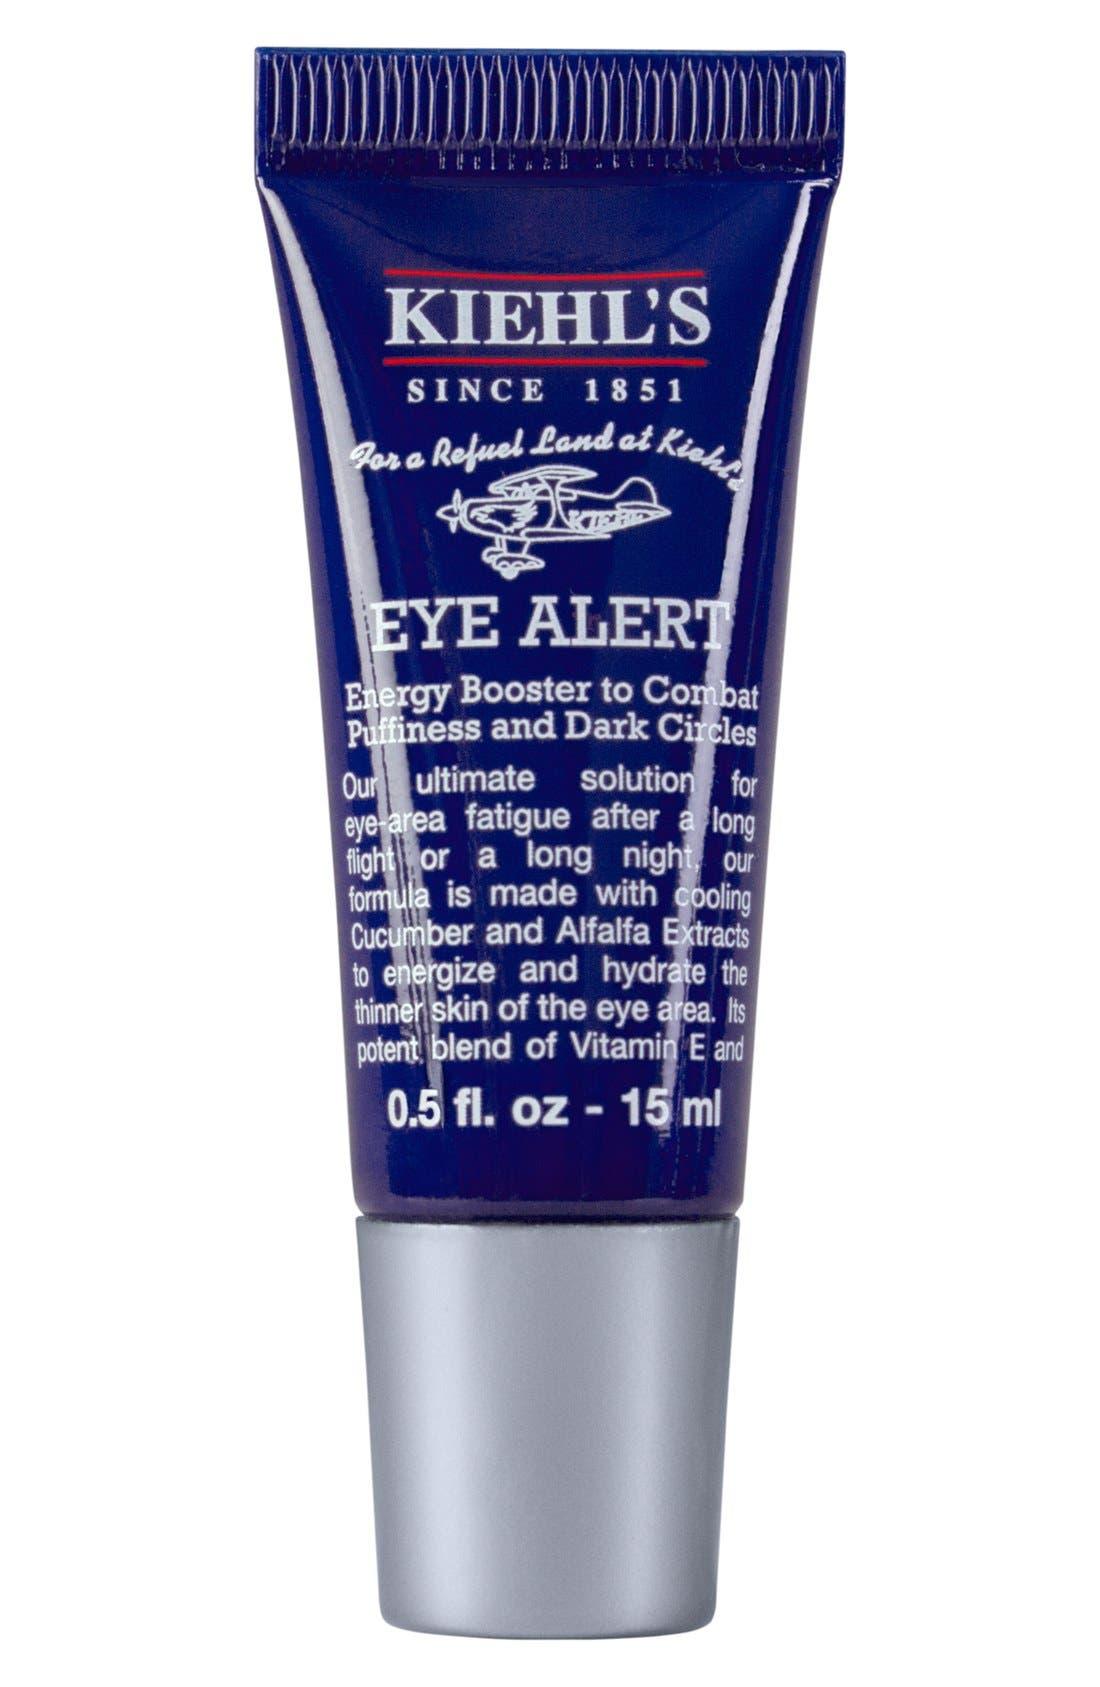 Kiehl's Since 1851 Eye Alert for Men